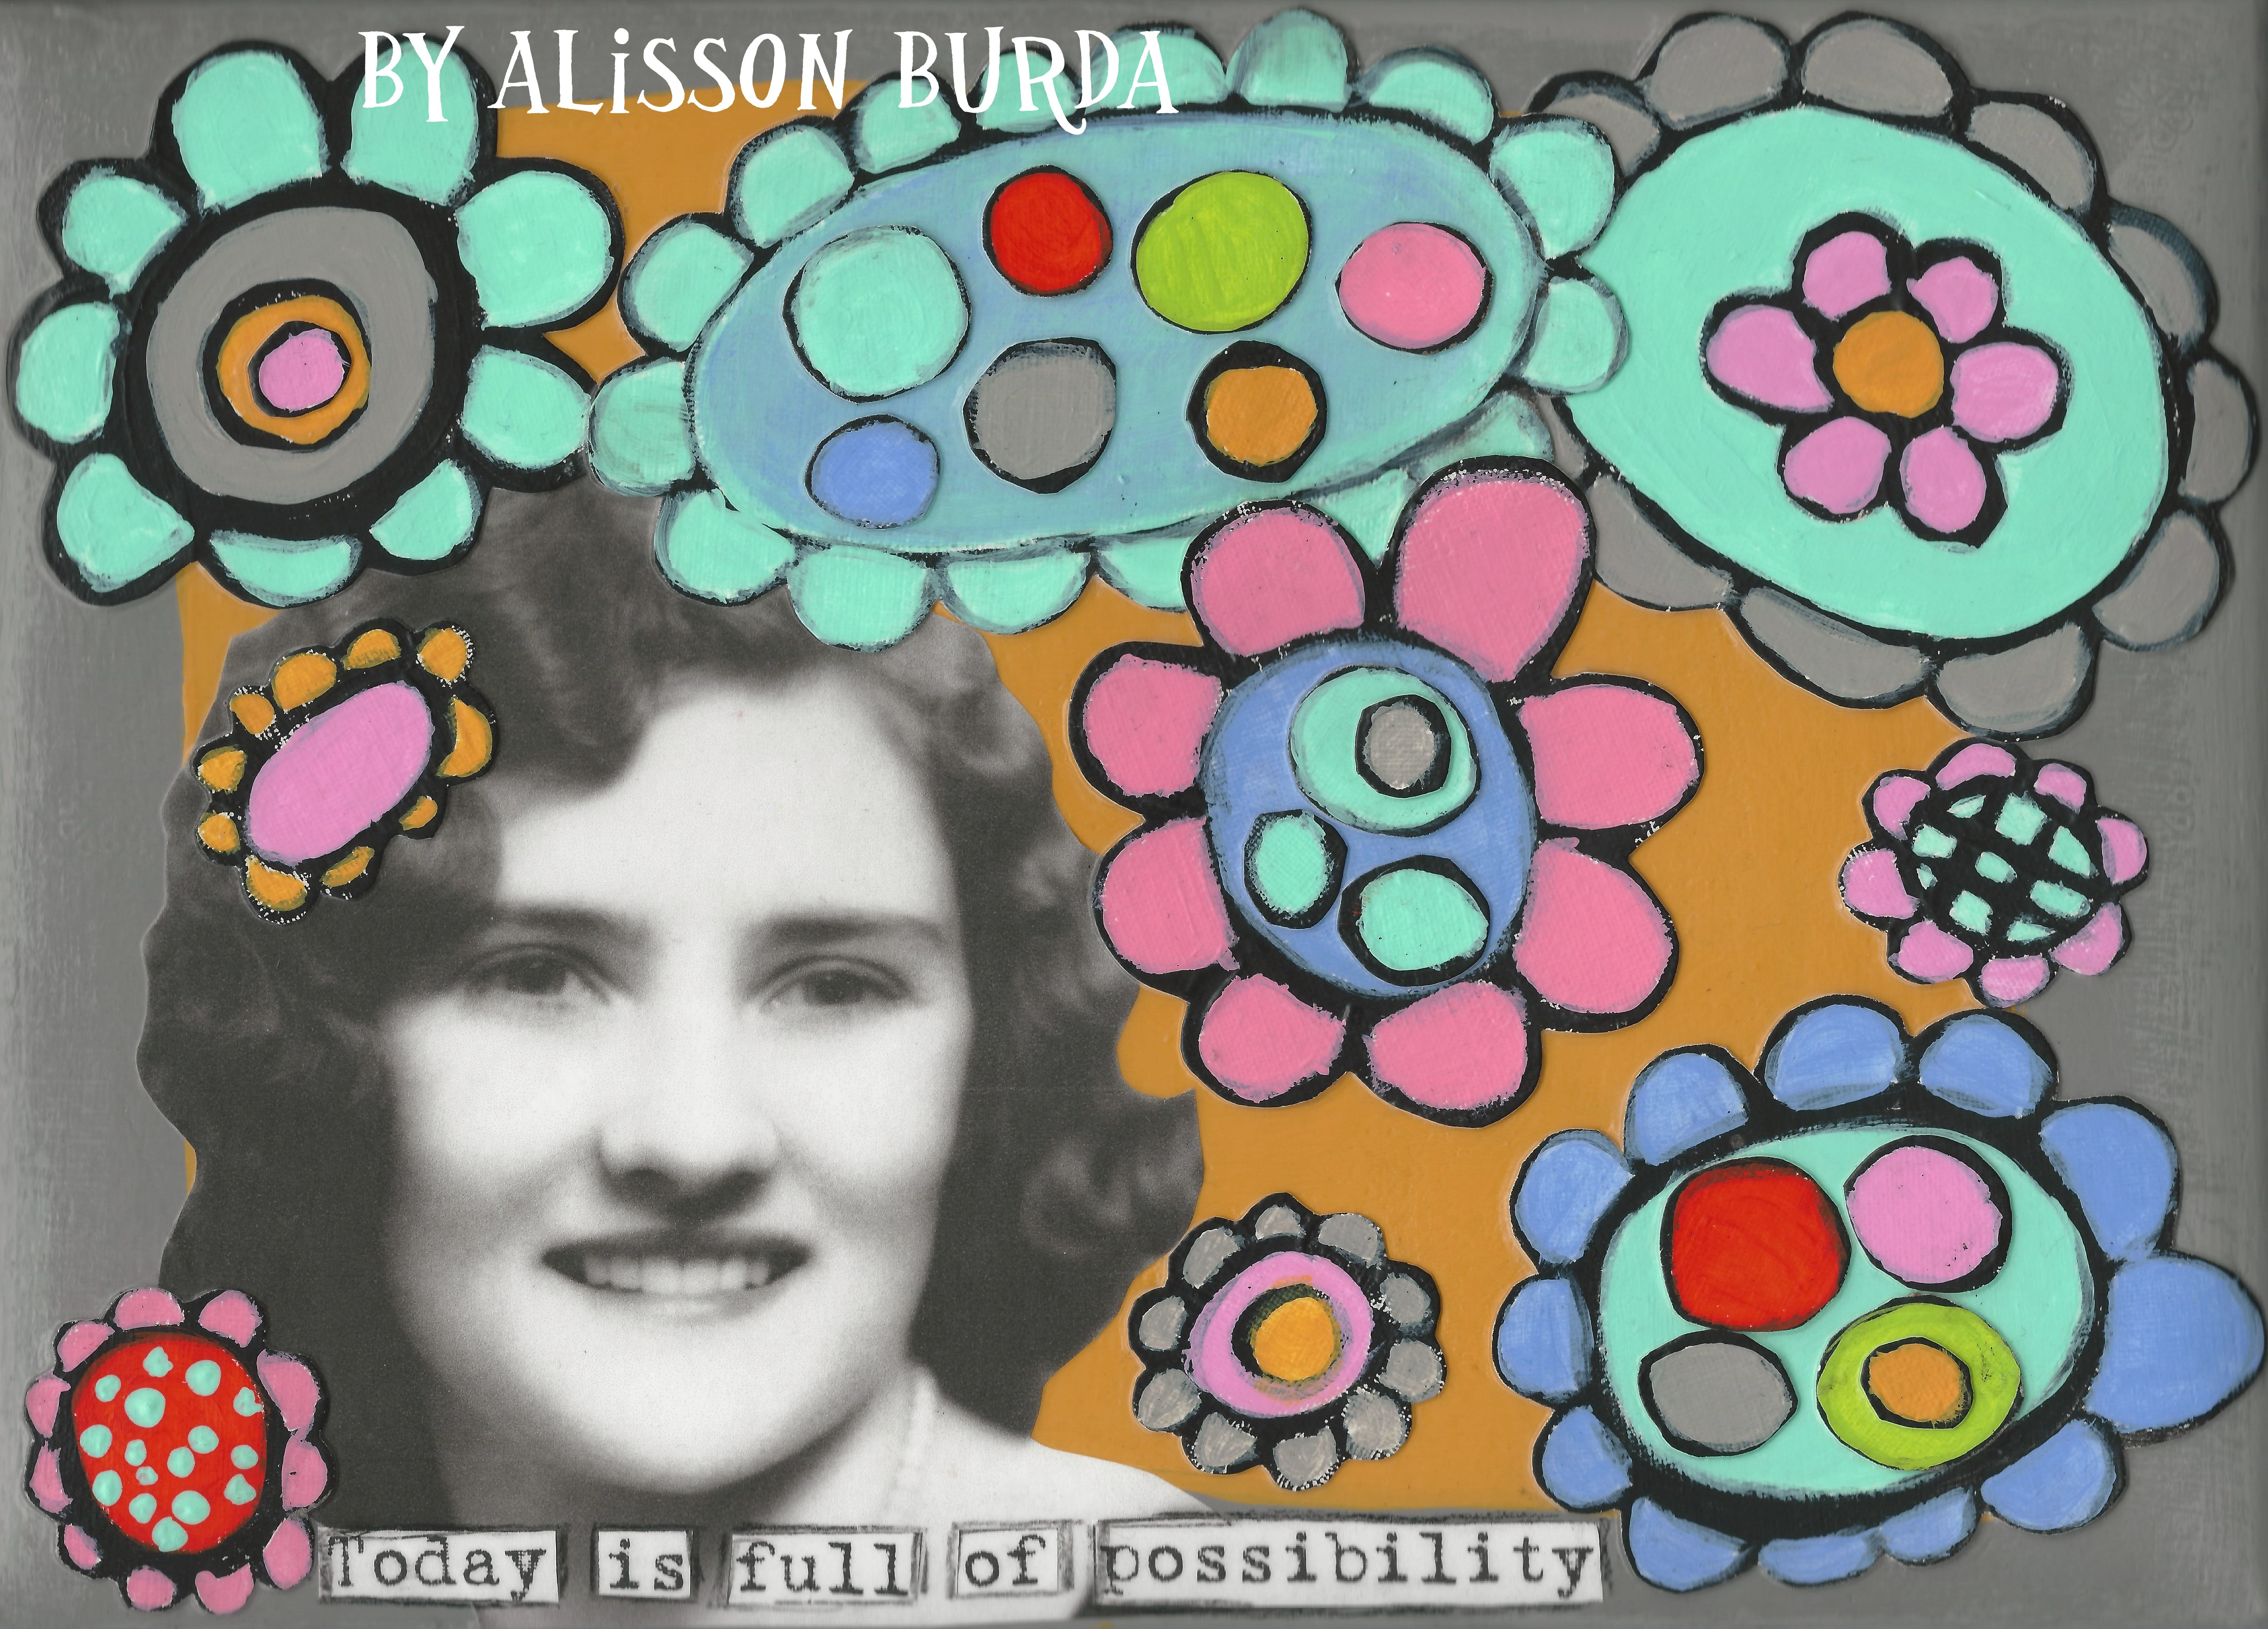 Full of Possibilities. Artsy Fartsy by Alisson Burda. http://myartsyfartsylife.blogspot.com/